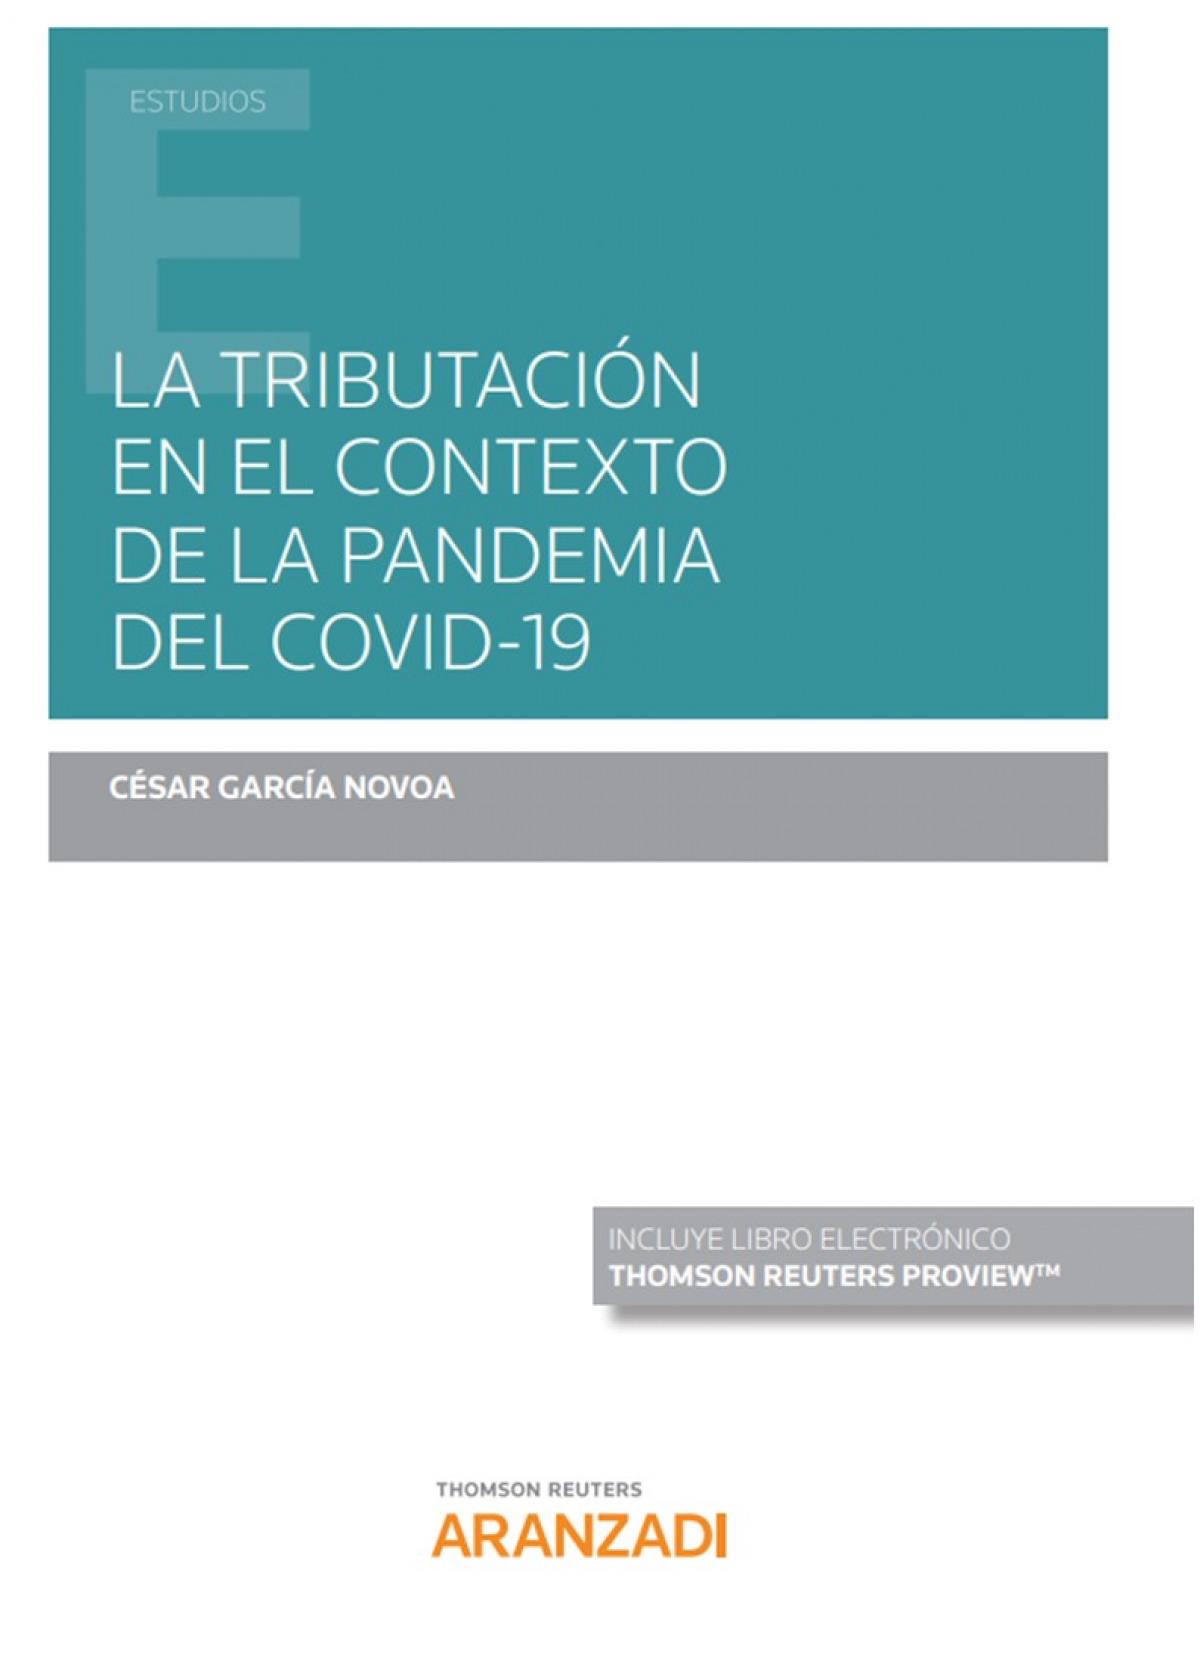 TRIBUTACION EN EL CONTEXTO PANDEMIA DEL COVID 19 DUO 9788413457734